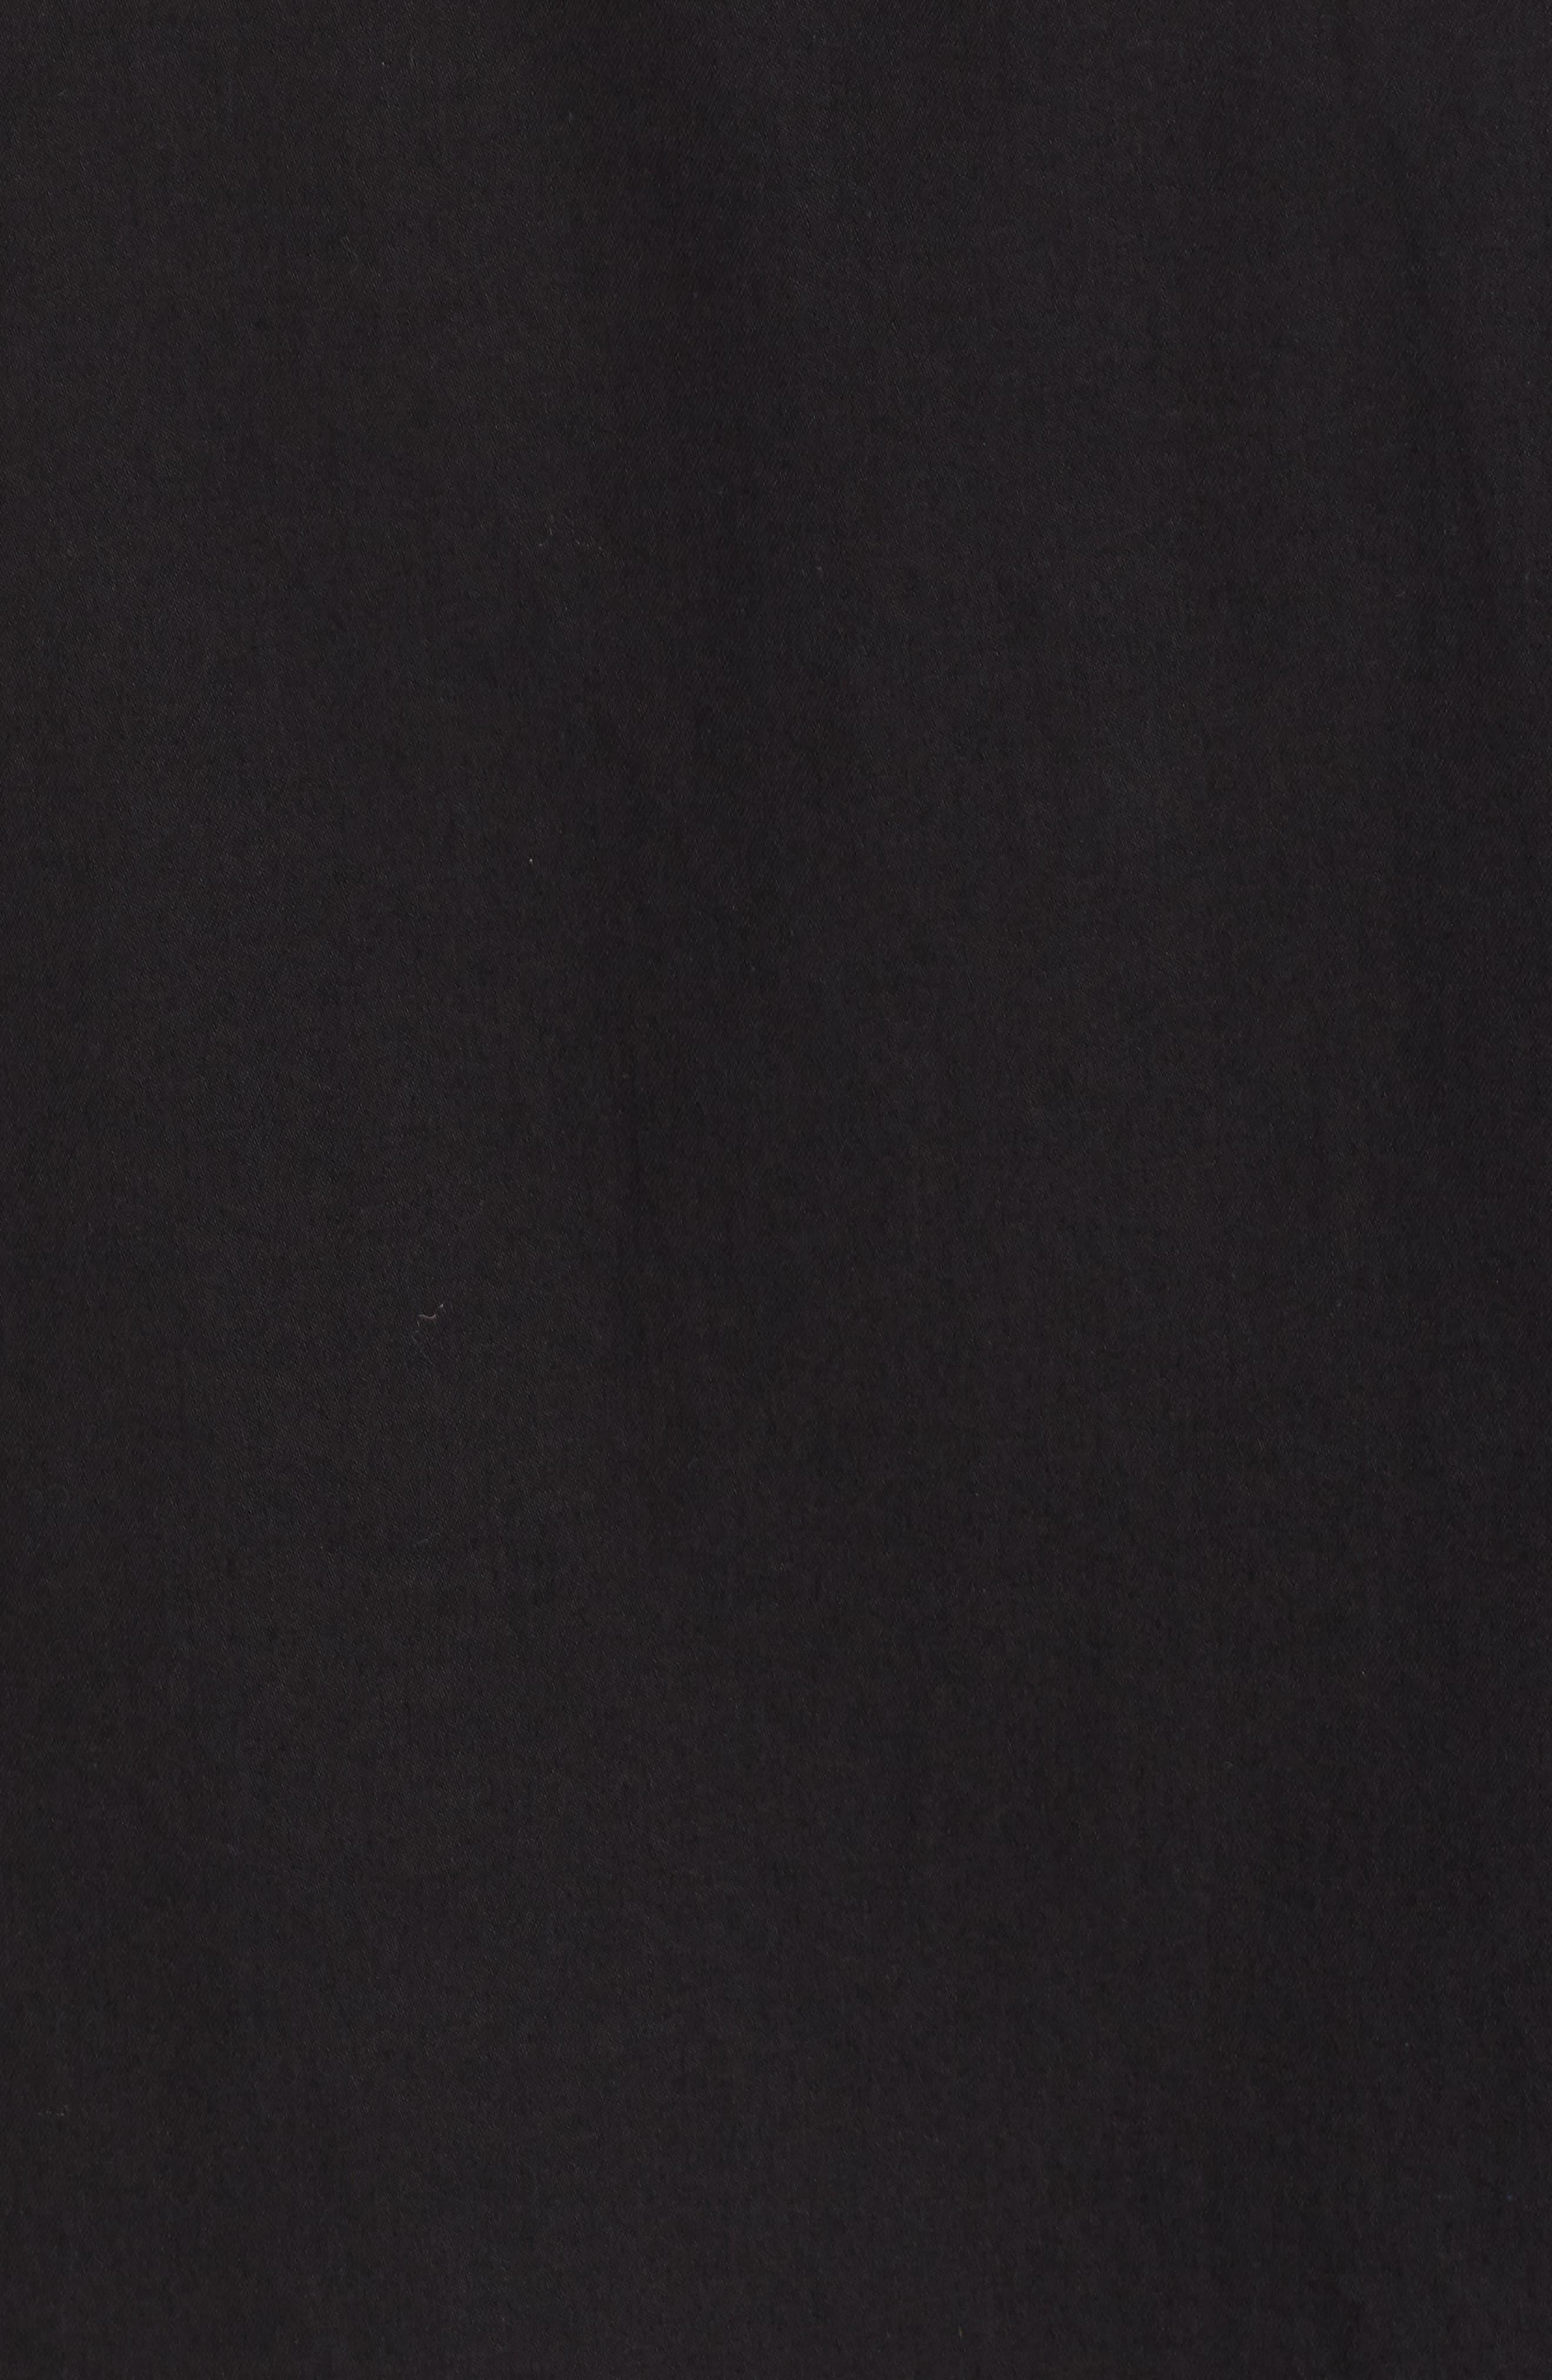 Stalt C-Less Shirt,                             Alternate thumbnail 5, color,                             001